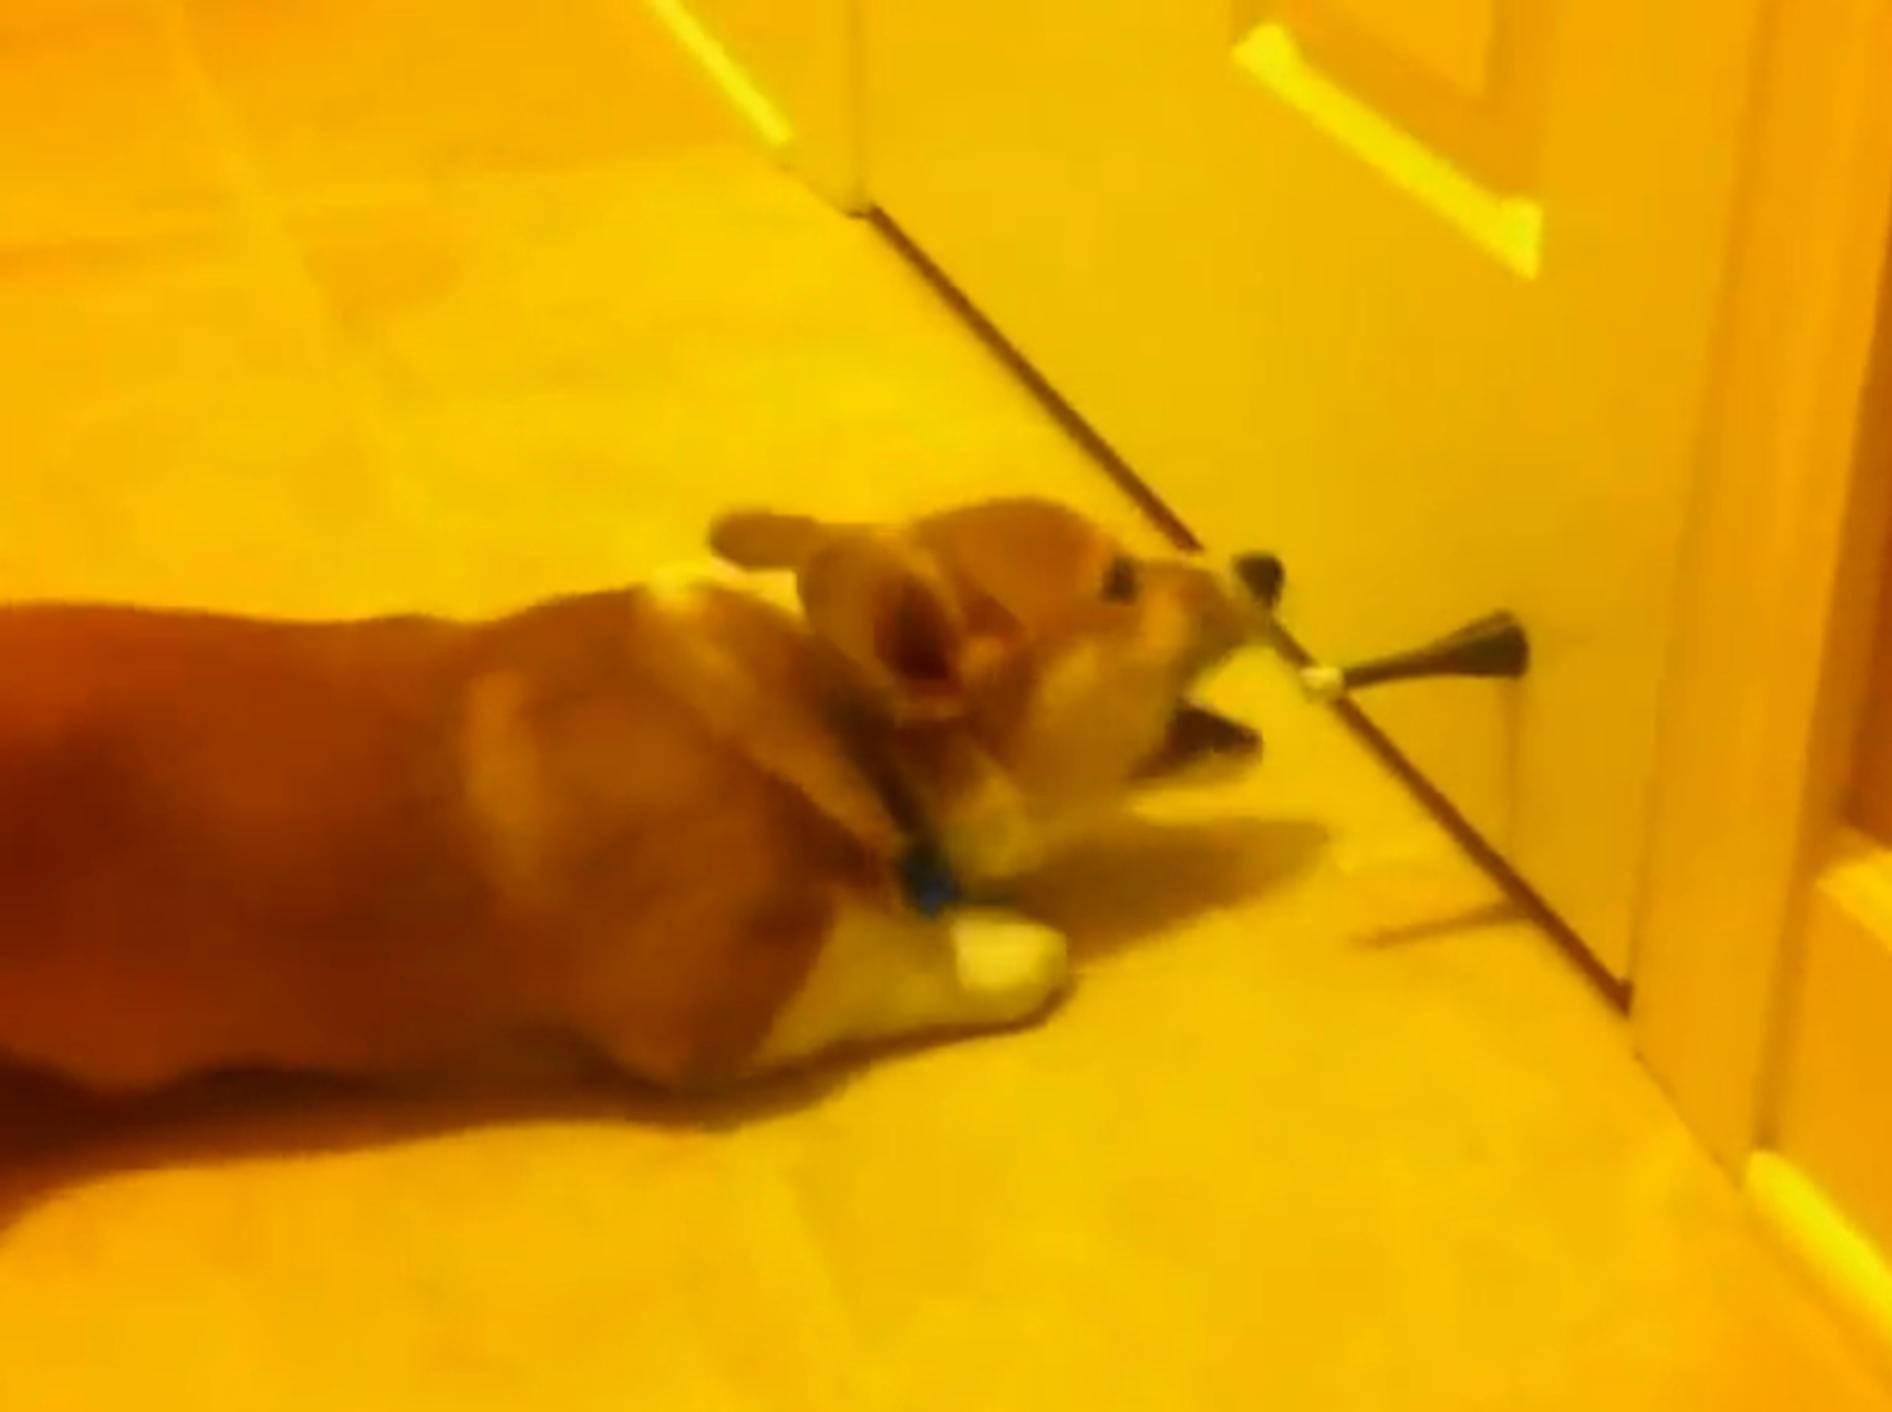 Corgi legt sich mit Türstopper an – Bild: YouTube / metarlogic